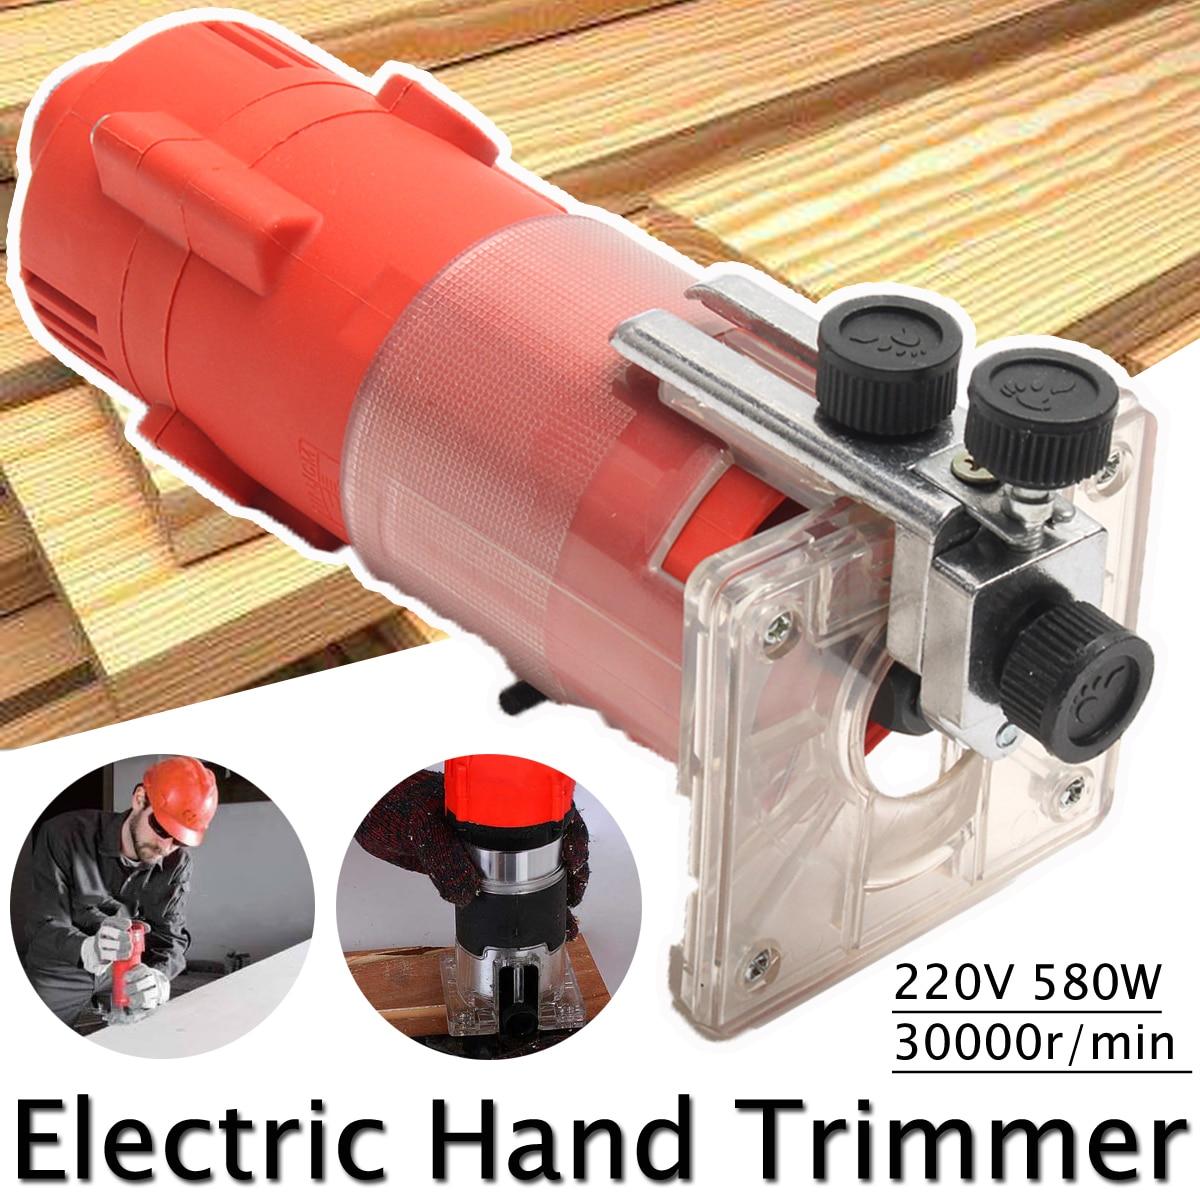 6,35 RPM 220 V enrutador de madera 30000mm recoger diámetro eléctrico mano recortadora carpintería laminada Palms enrutador Joiner herramienta